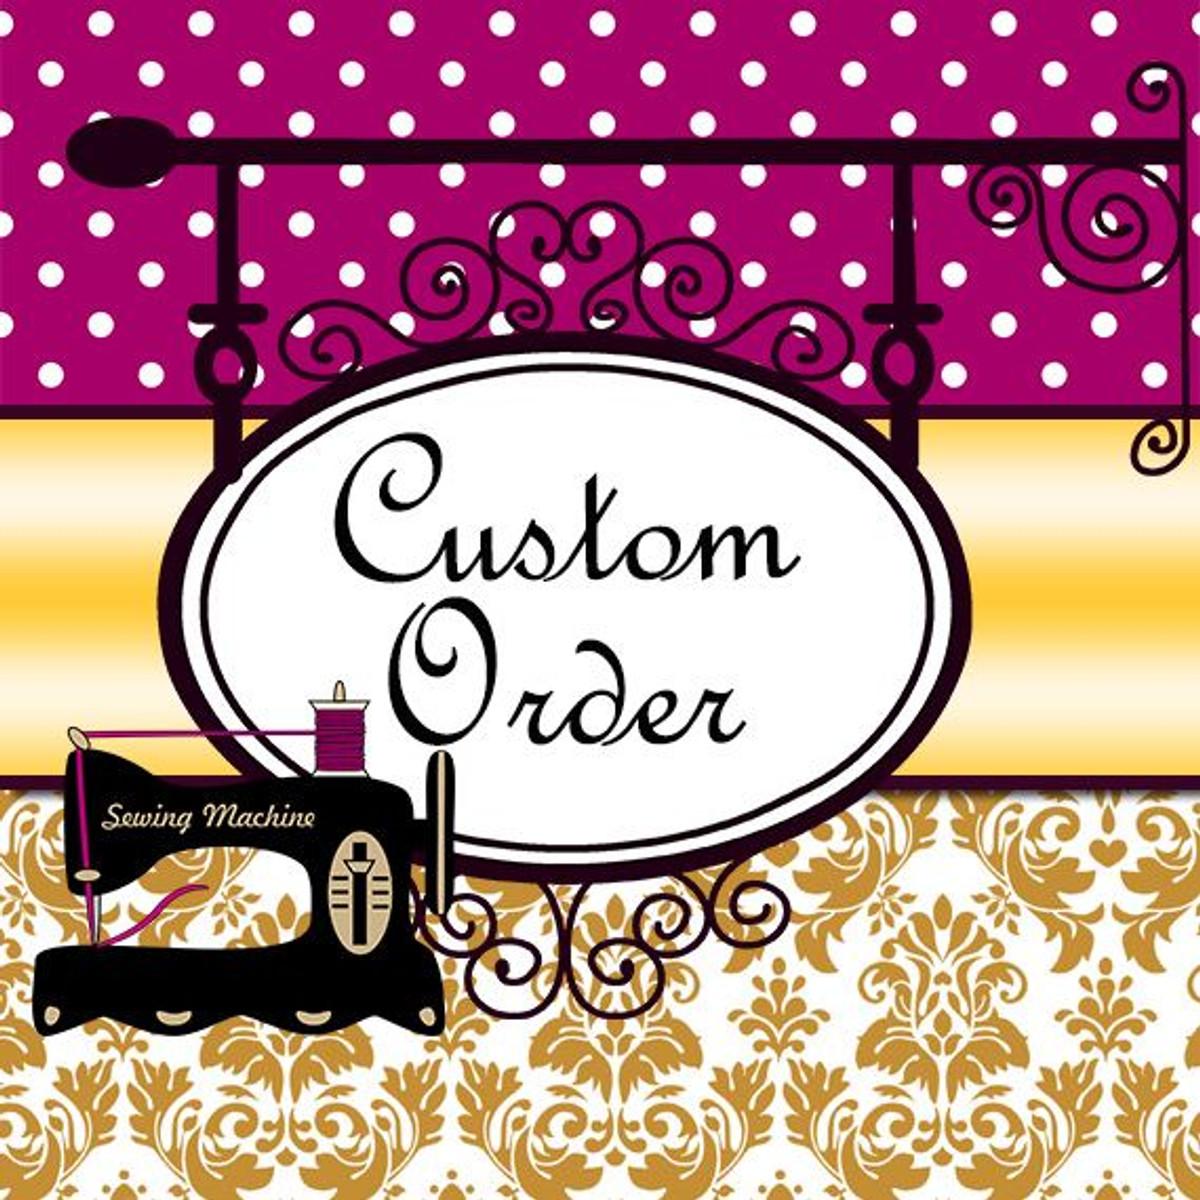 Custom Wedding Dress for Samantha E.